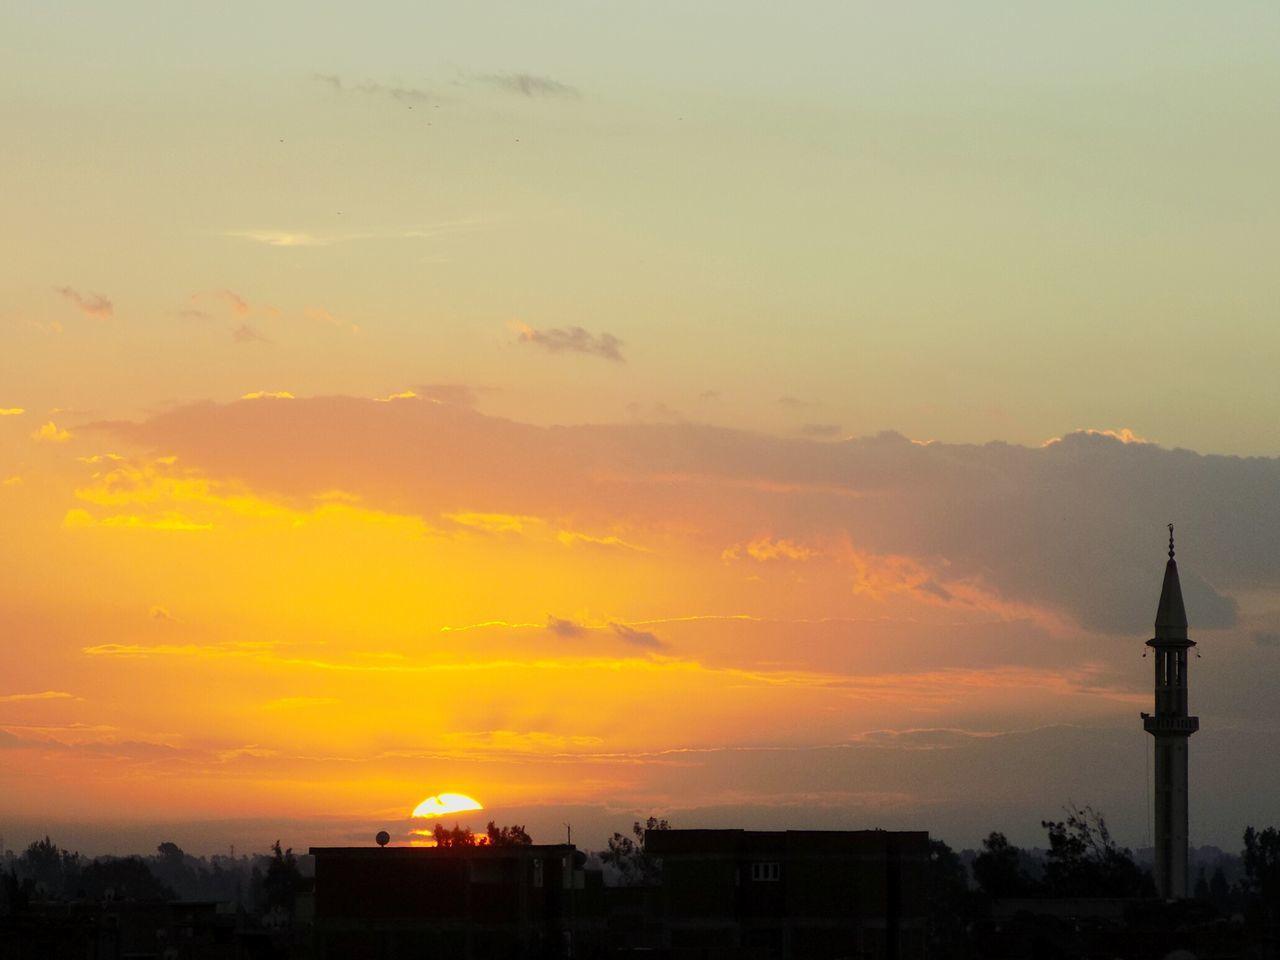 Sunset ❤ VSCO Vscocam Egypt Myegypt Egyptbyme Thisisegypt Everydayegypt Landscape Sky Sun Sunset Tower Nature Wanderfull Life Nothingisordinary_ Bnw_life Colors Still Life StillLifePhotography Photo Photography Camera Nikon Like4like likeforlike #likemyphoto #qlikemyphotos #like4like #likemypic #likeback #ilikeback #10likes #50likes #100likes 20likes likere follow #f4f #followme #TagsForLikes #TFLers #followforfollow #follow4follow #teamfollowback #followher followbackteam followh